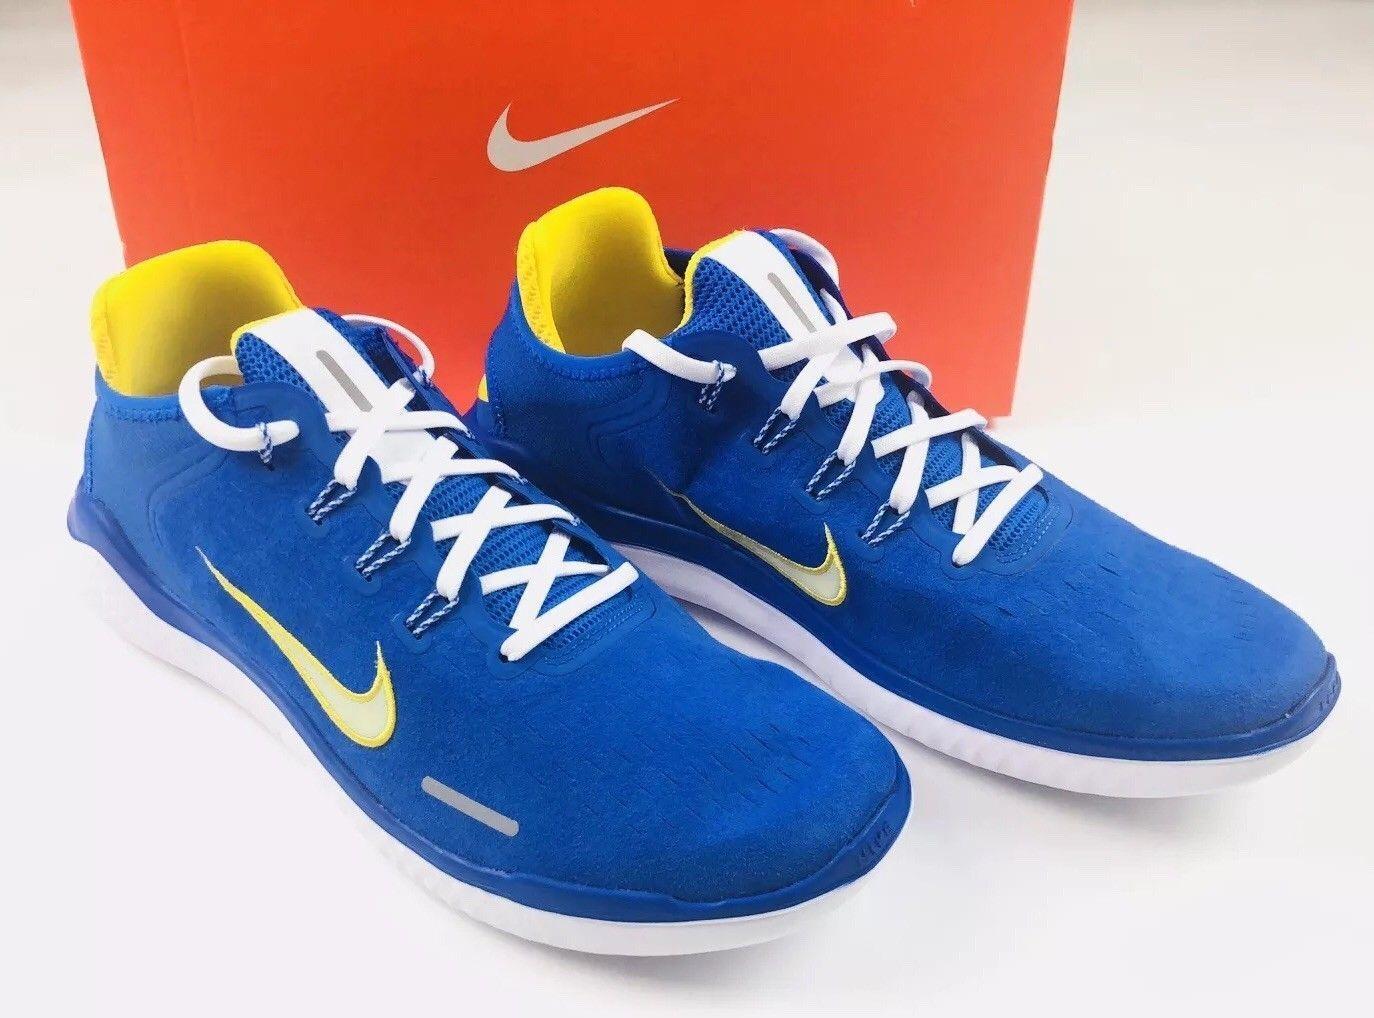 New Nike Free Run RN 2018 DNA shoes bluee Cobalt Citron AH7870 400 Mens Sz-13